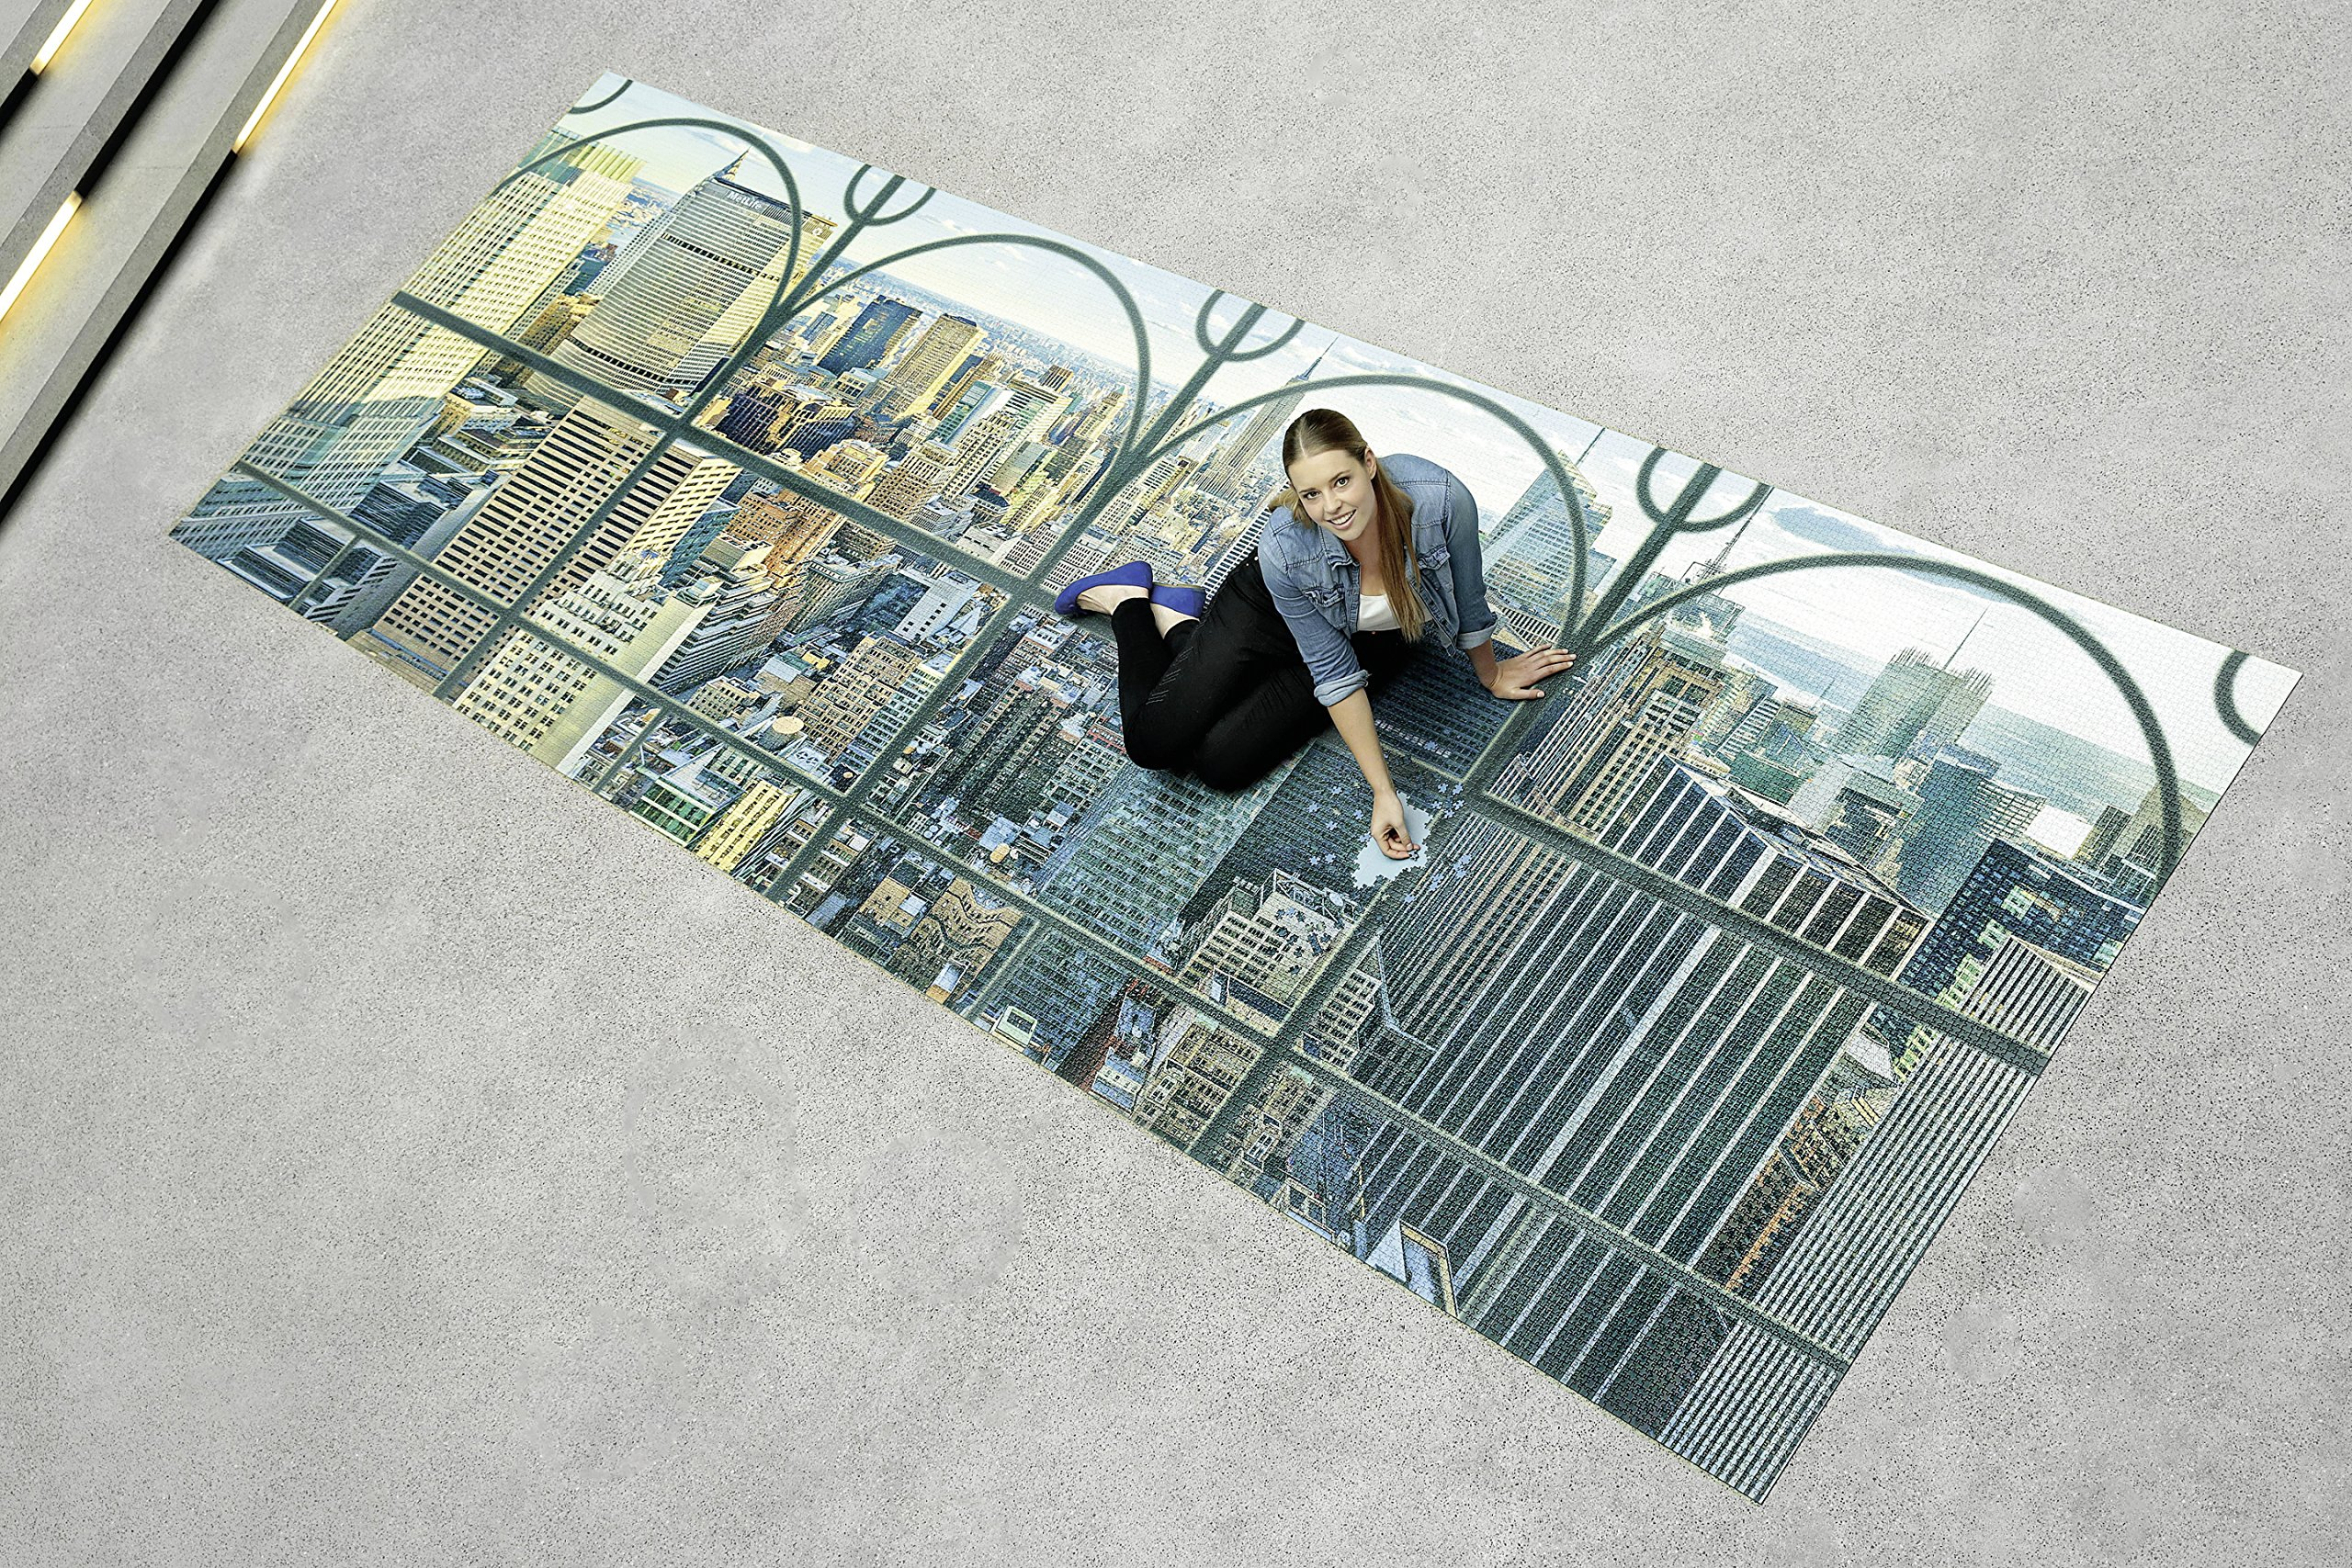 Ravensburger New York City Jigsaw Puzzle (32000-Piece) by Ravensburger (Image #3)